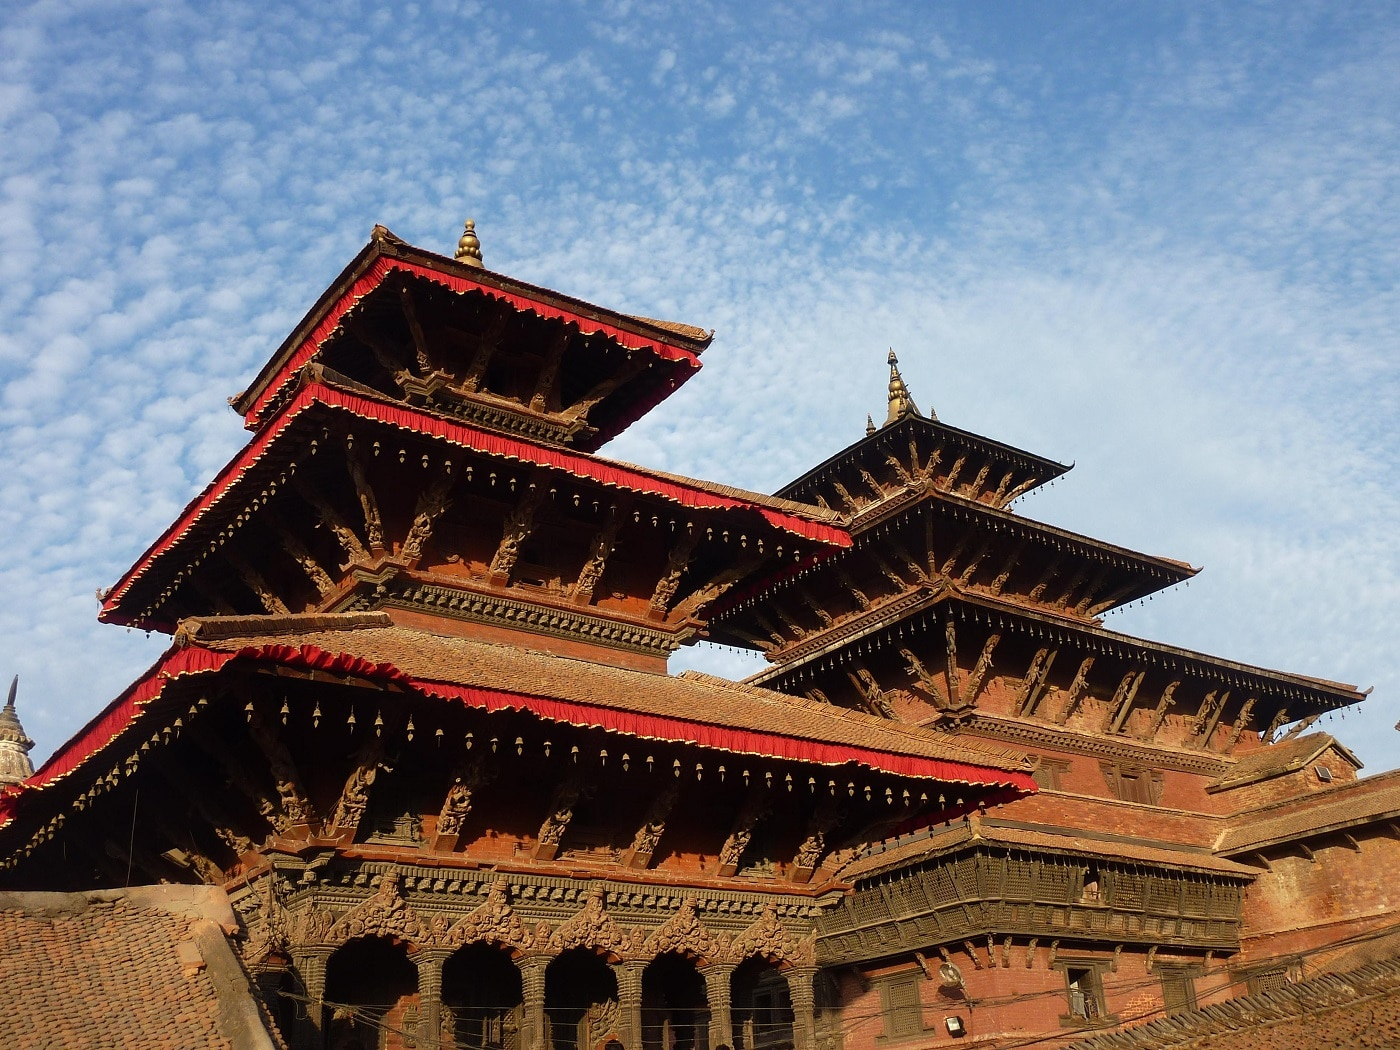 Templul Patan, detalii arhitecturale